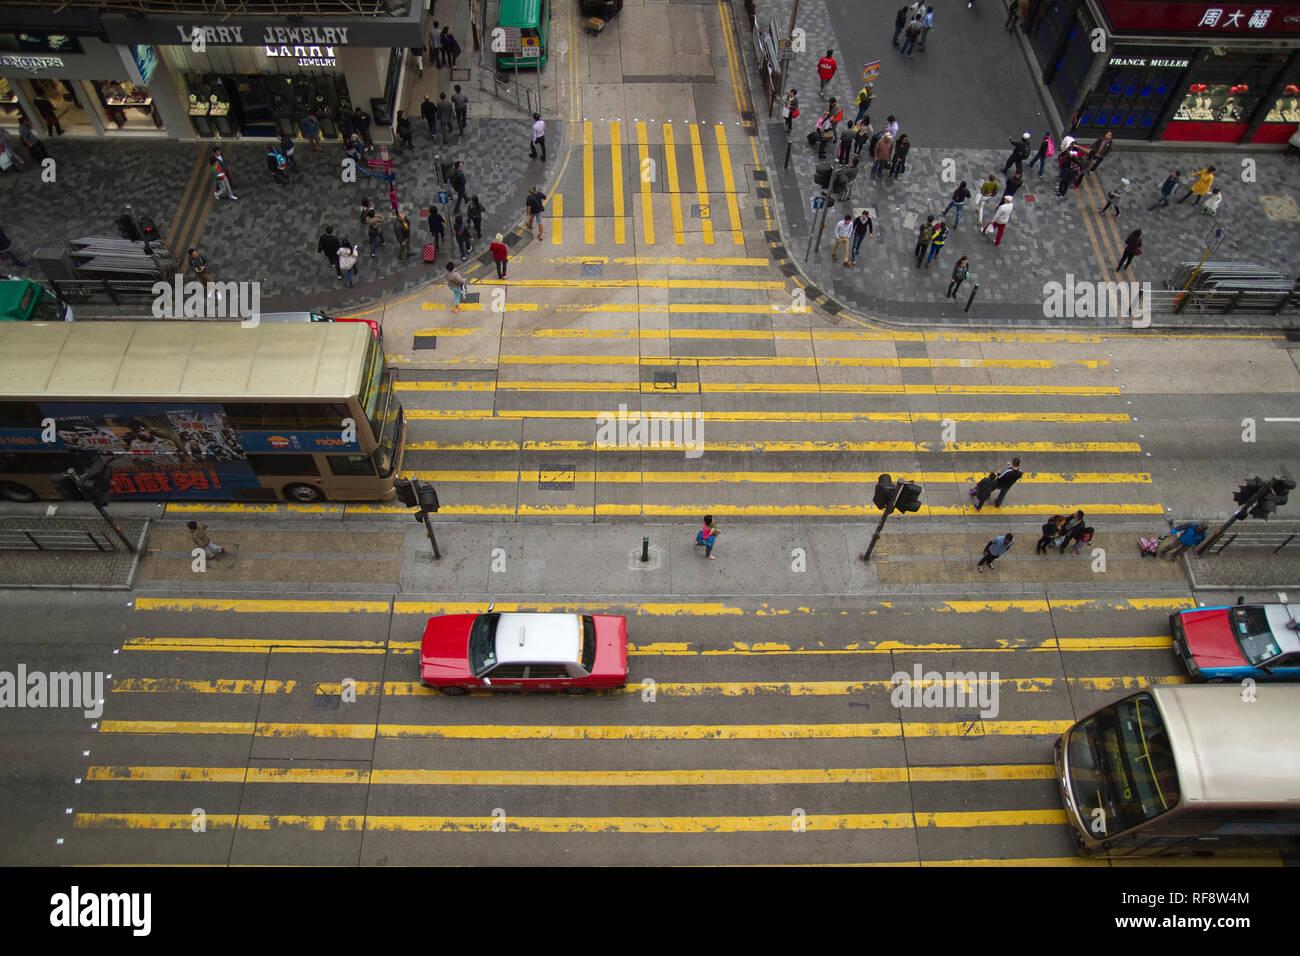 High view down to street crosing yellow markings Hong Kong - vehicles cars below - Stock Image